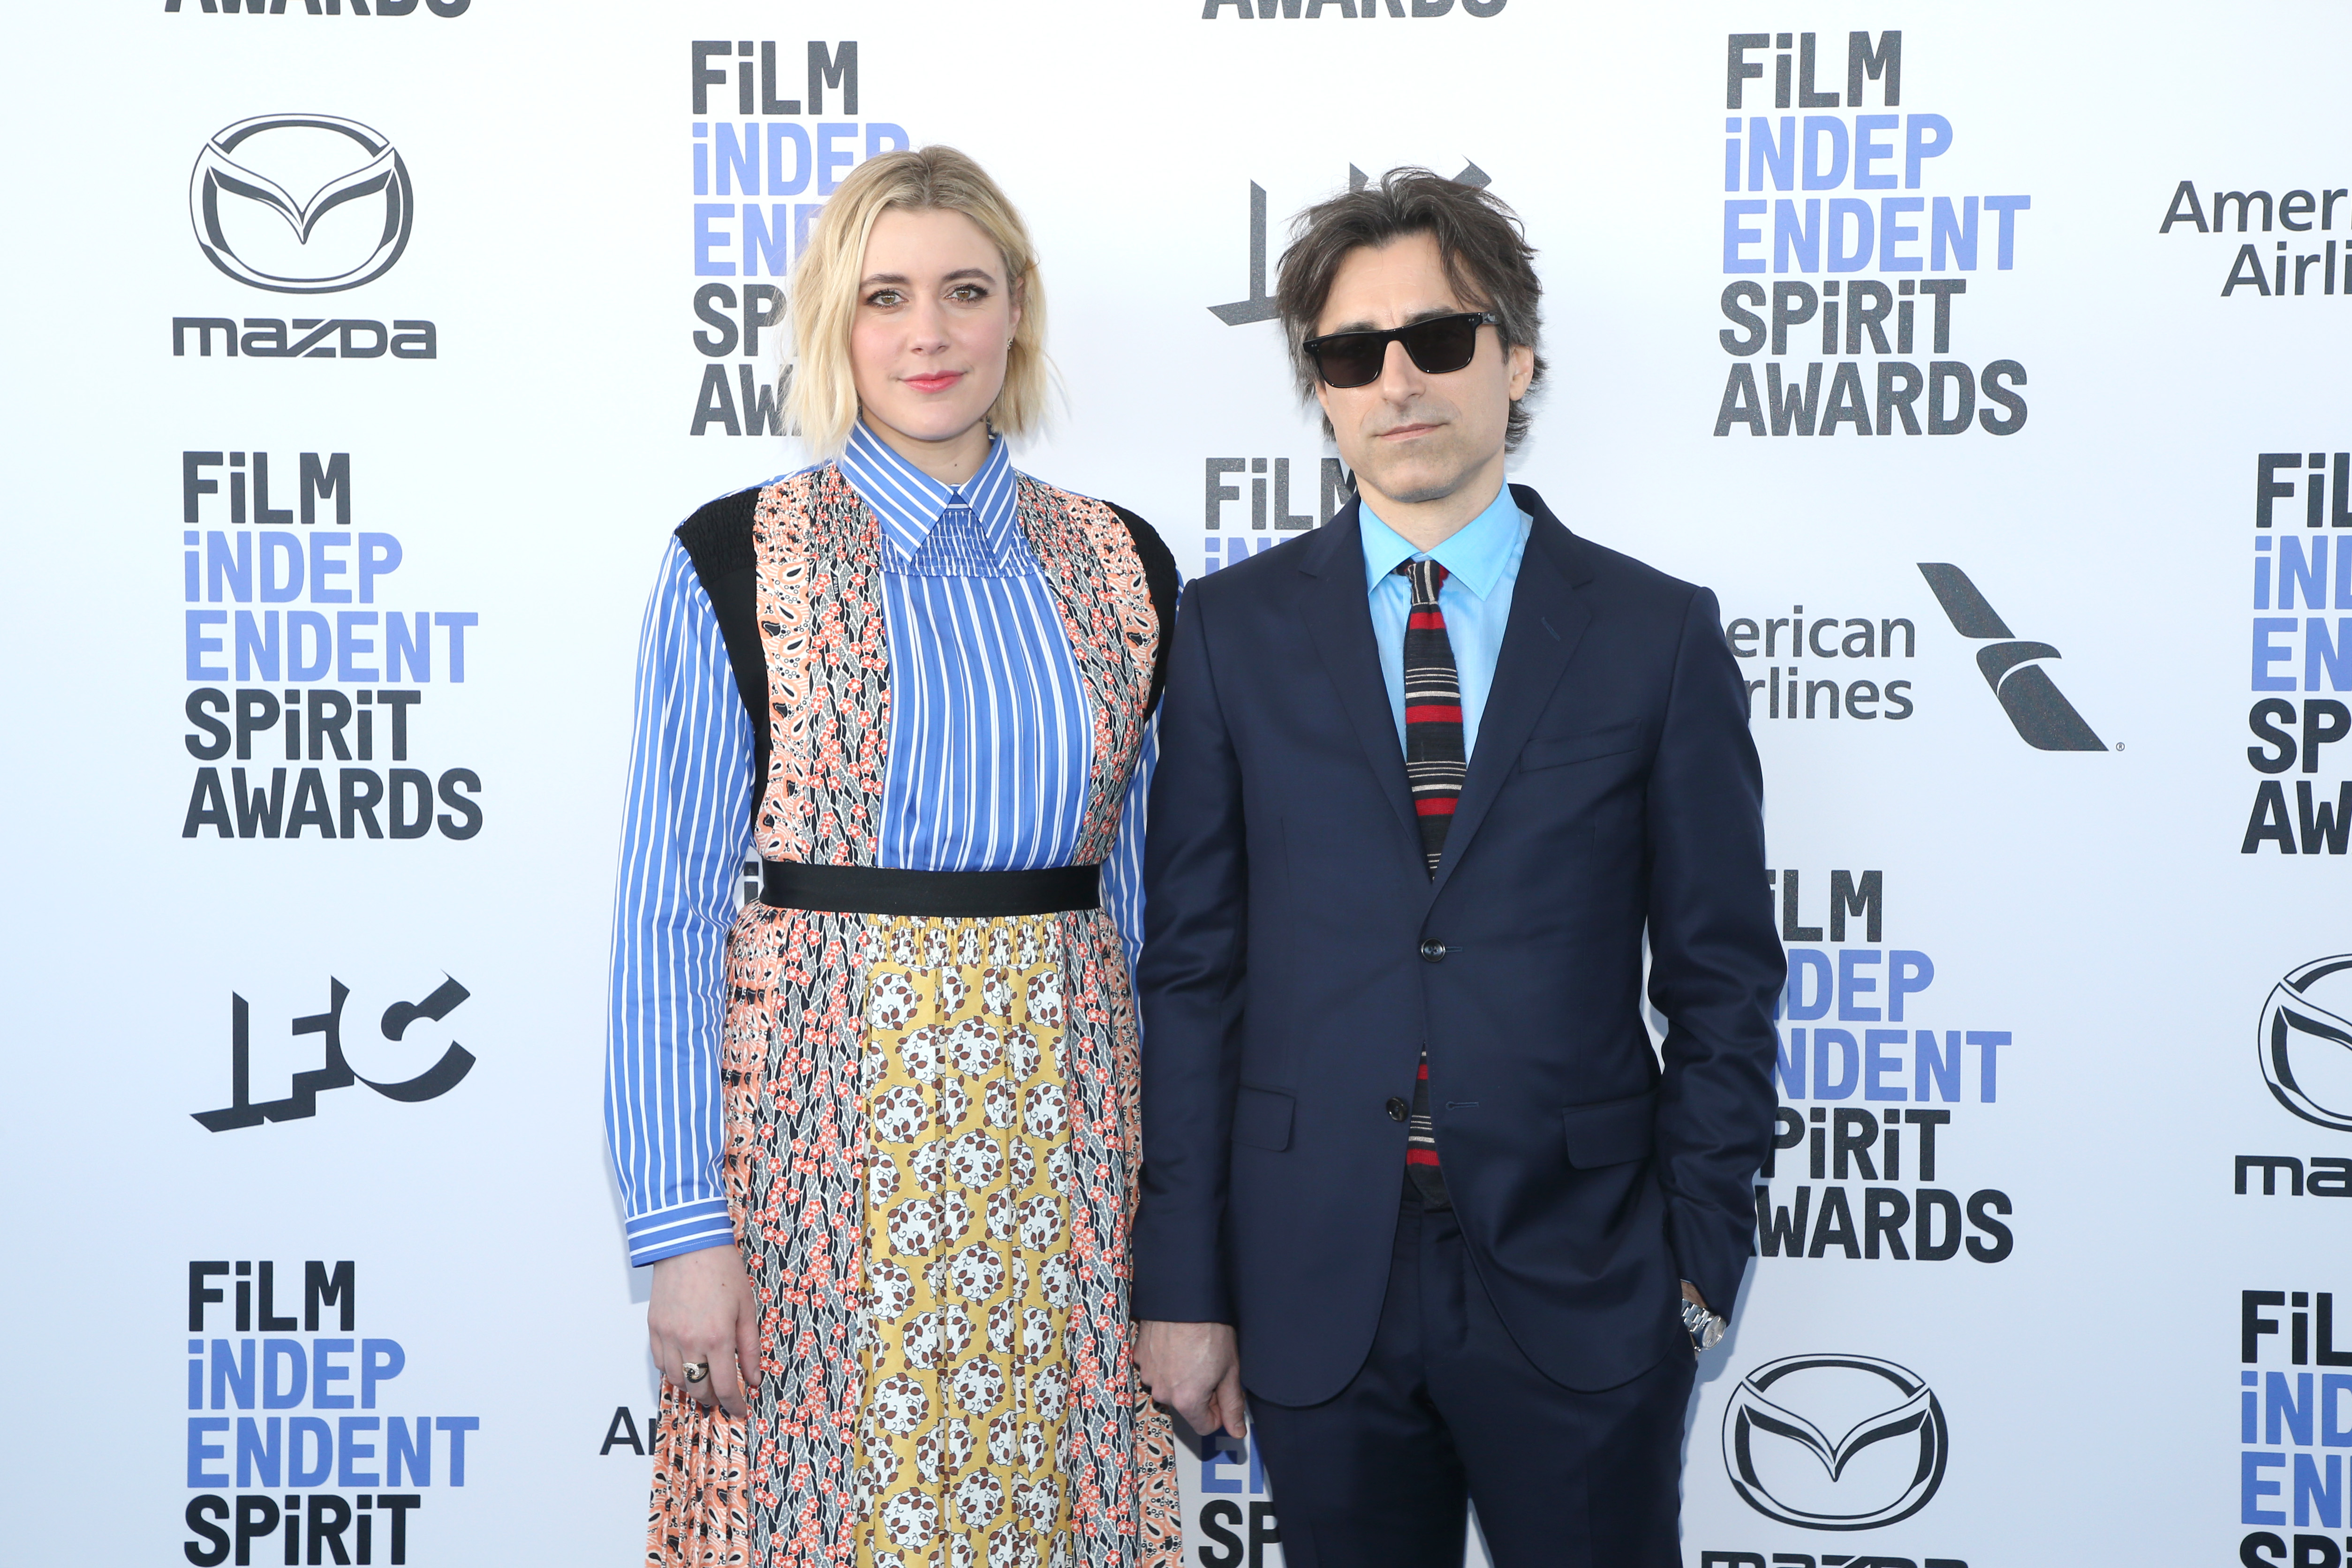 Noah Baumbach and Greta Gerwig at an event for 35th Film Independent Spirit Awards (2020)